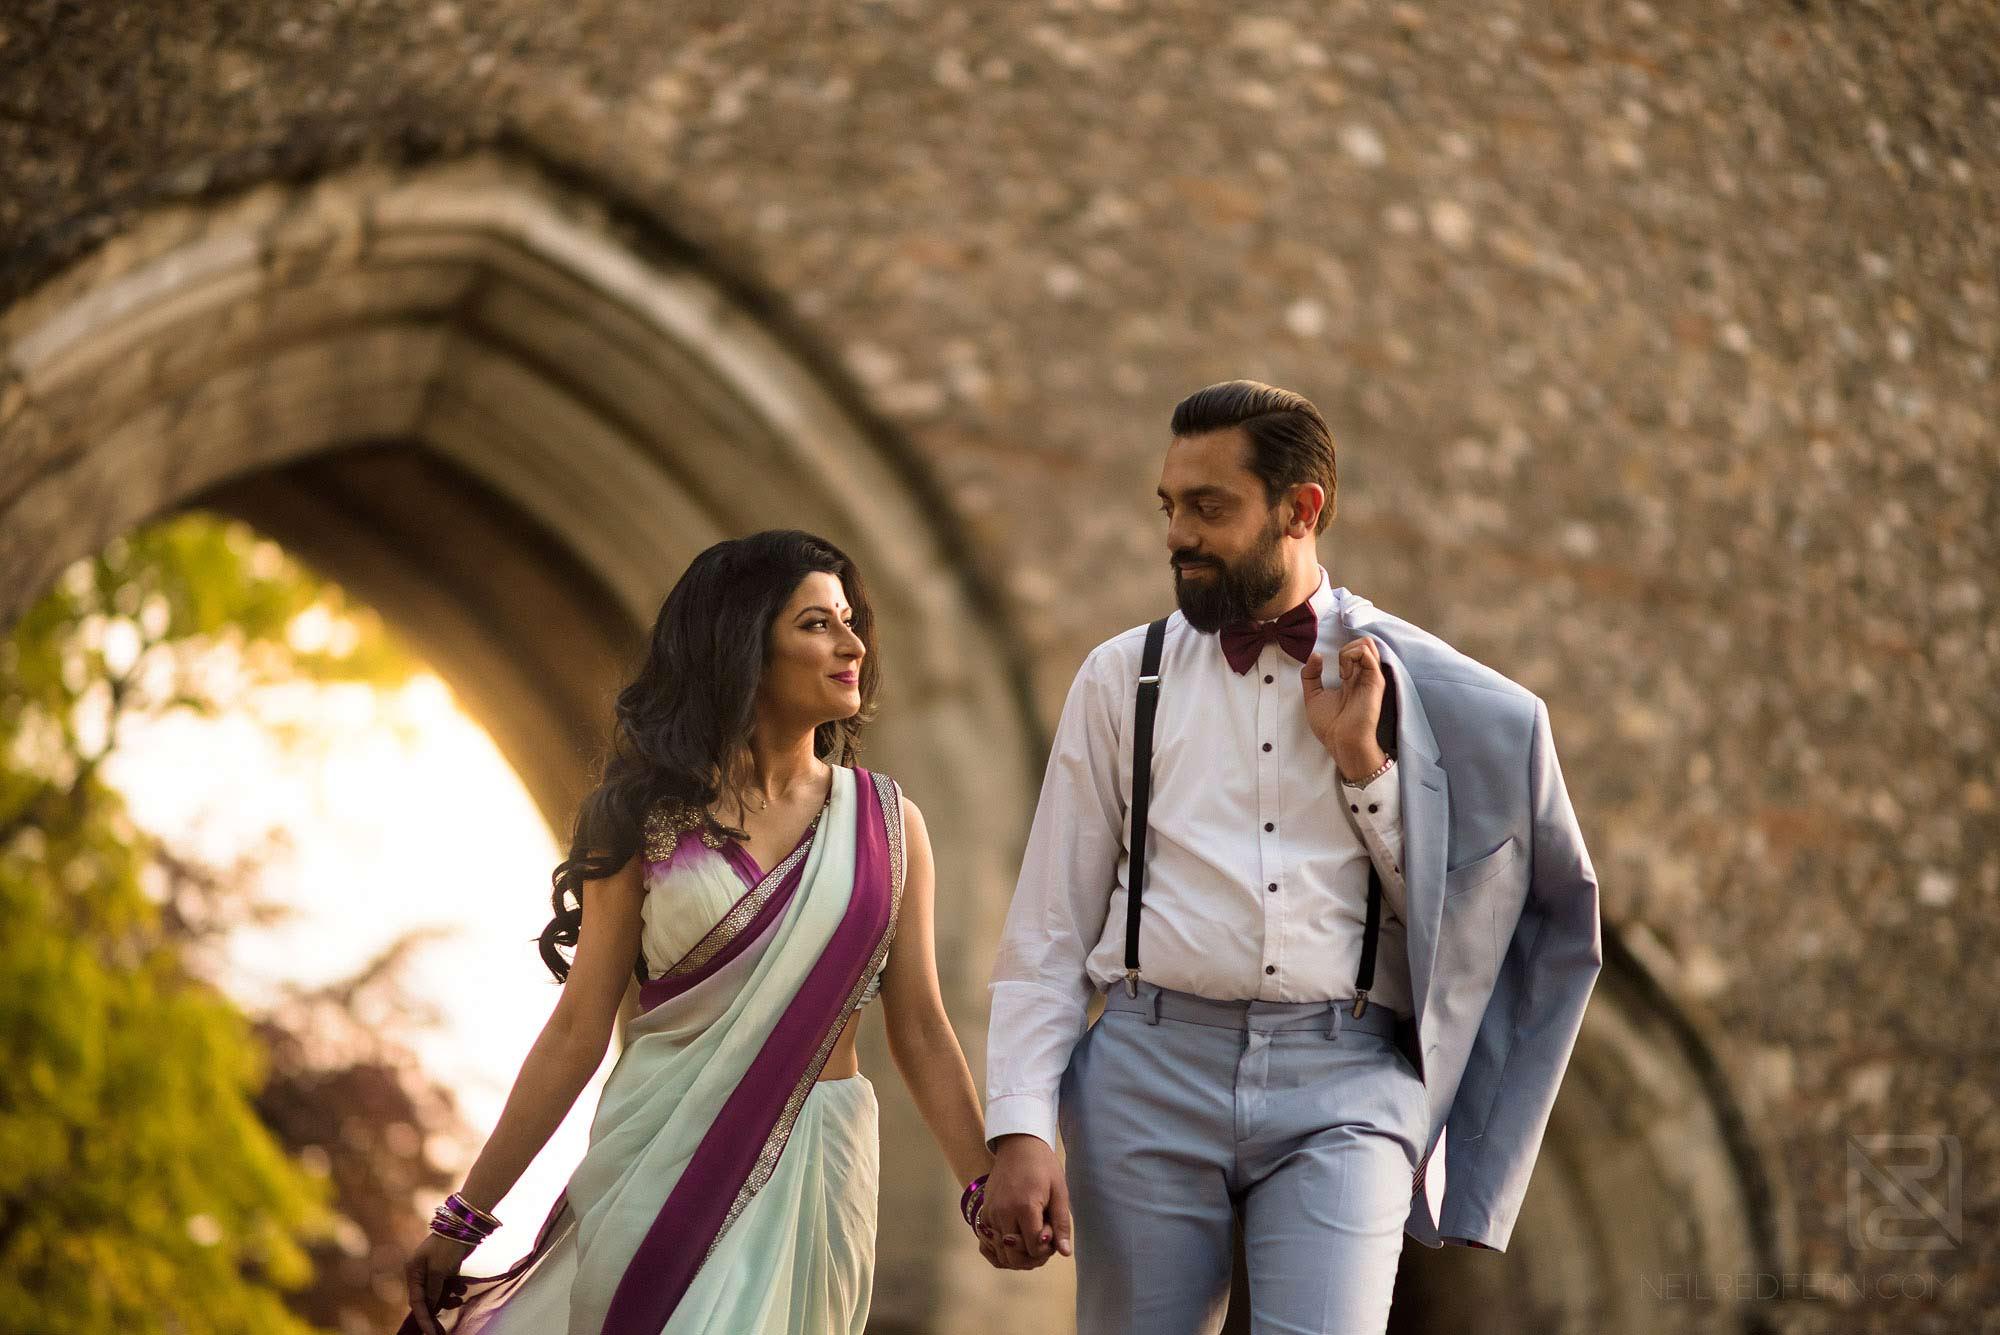 hindu couple walking through St Albans on engagement shoot